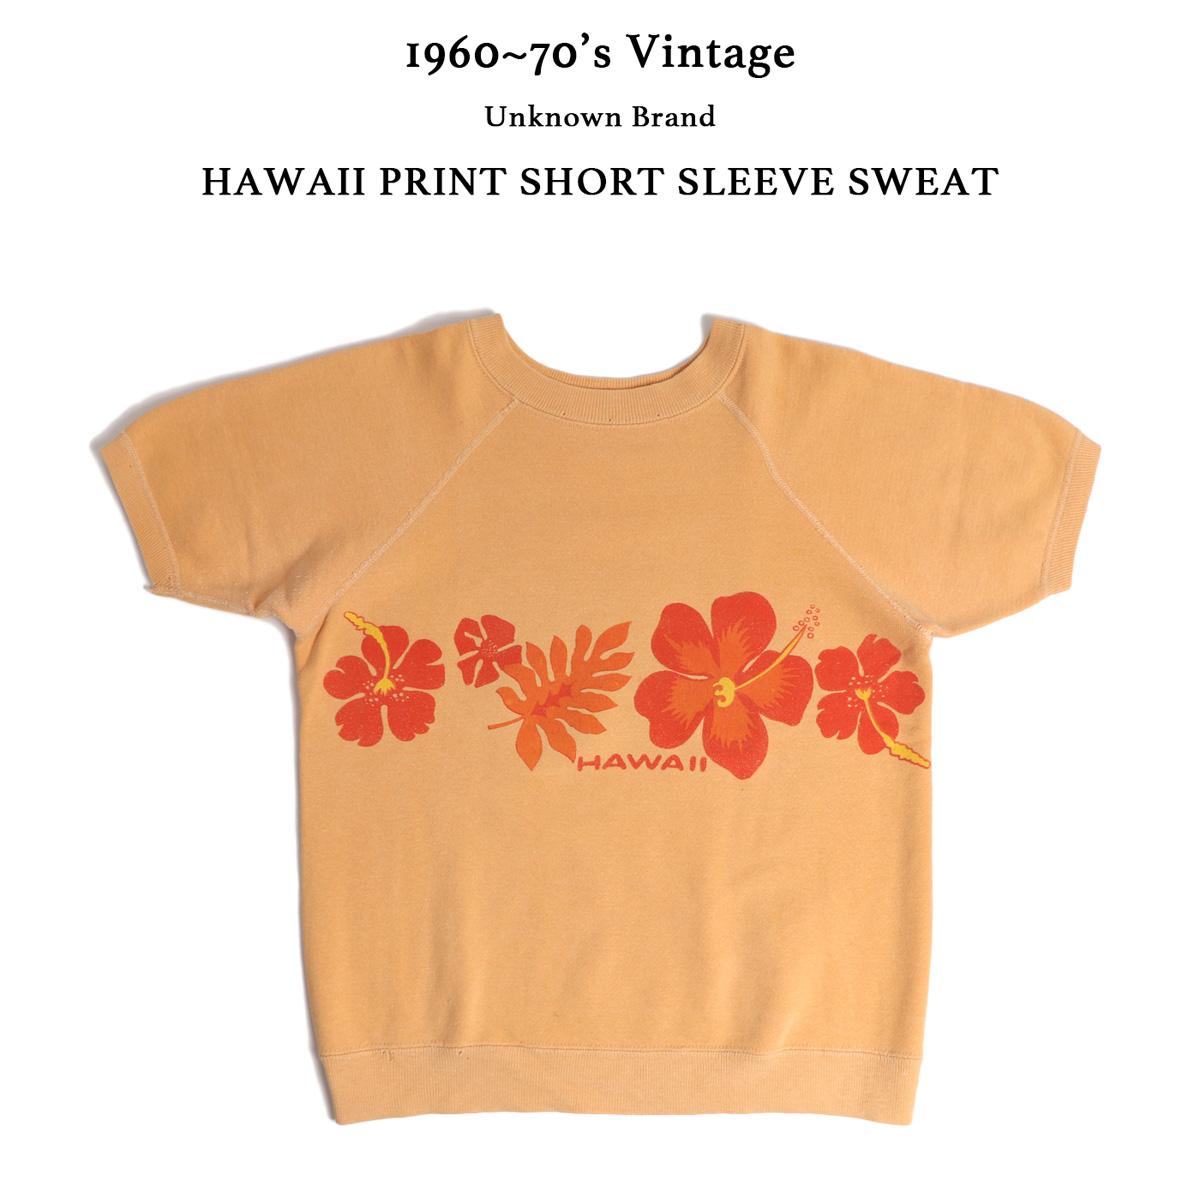 1960~70s VINTAGE UNKNOWN BRAND ハワイプリント半袖スウェット